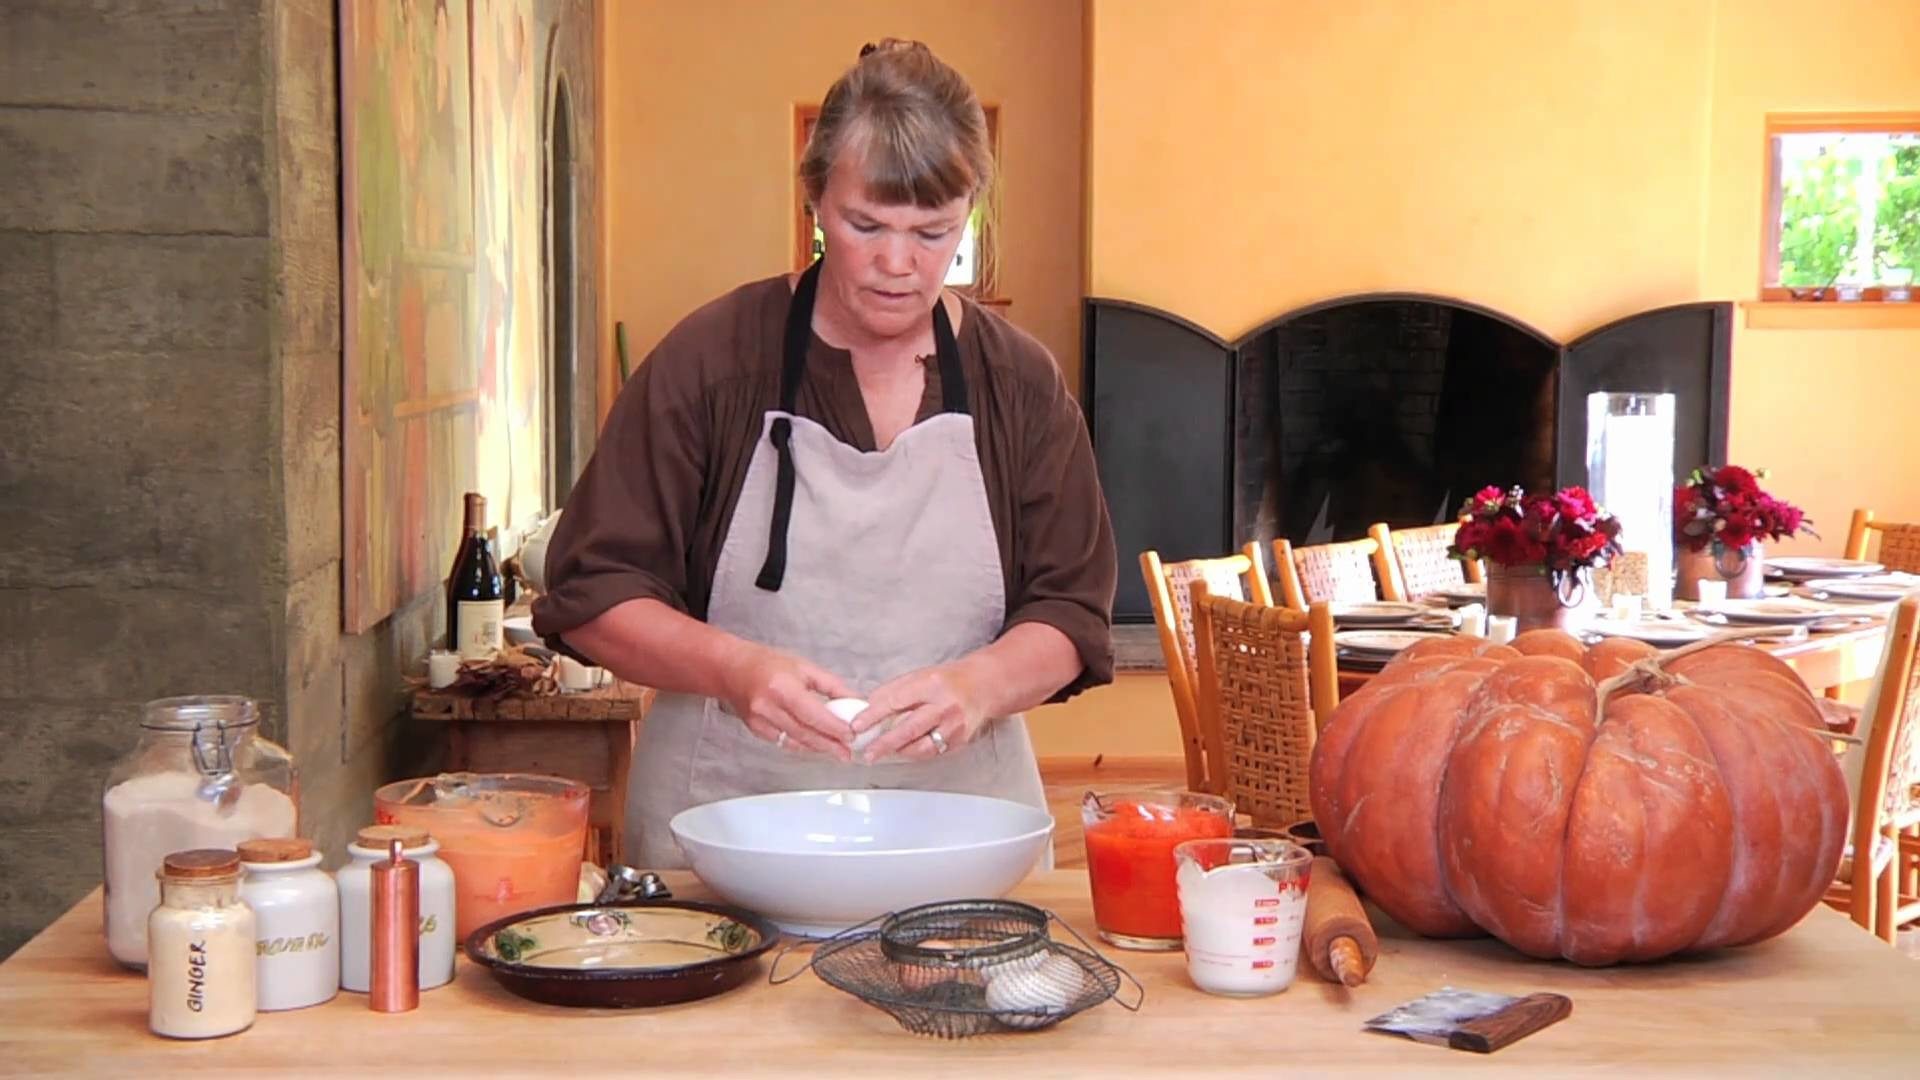 How to Make Pumpkin Pie: Thanksgiving Dinner Recipe | Pottery Barn